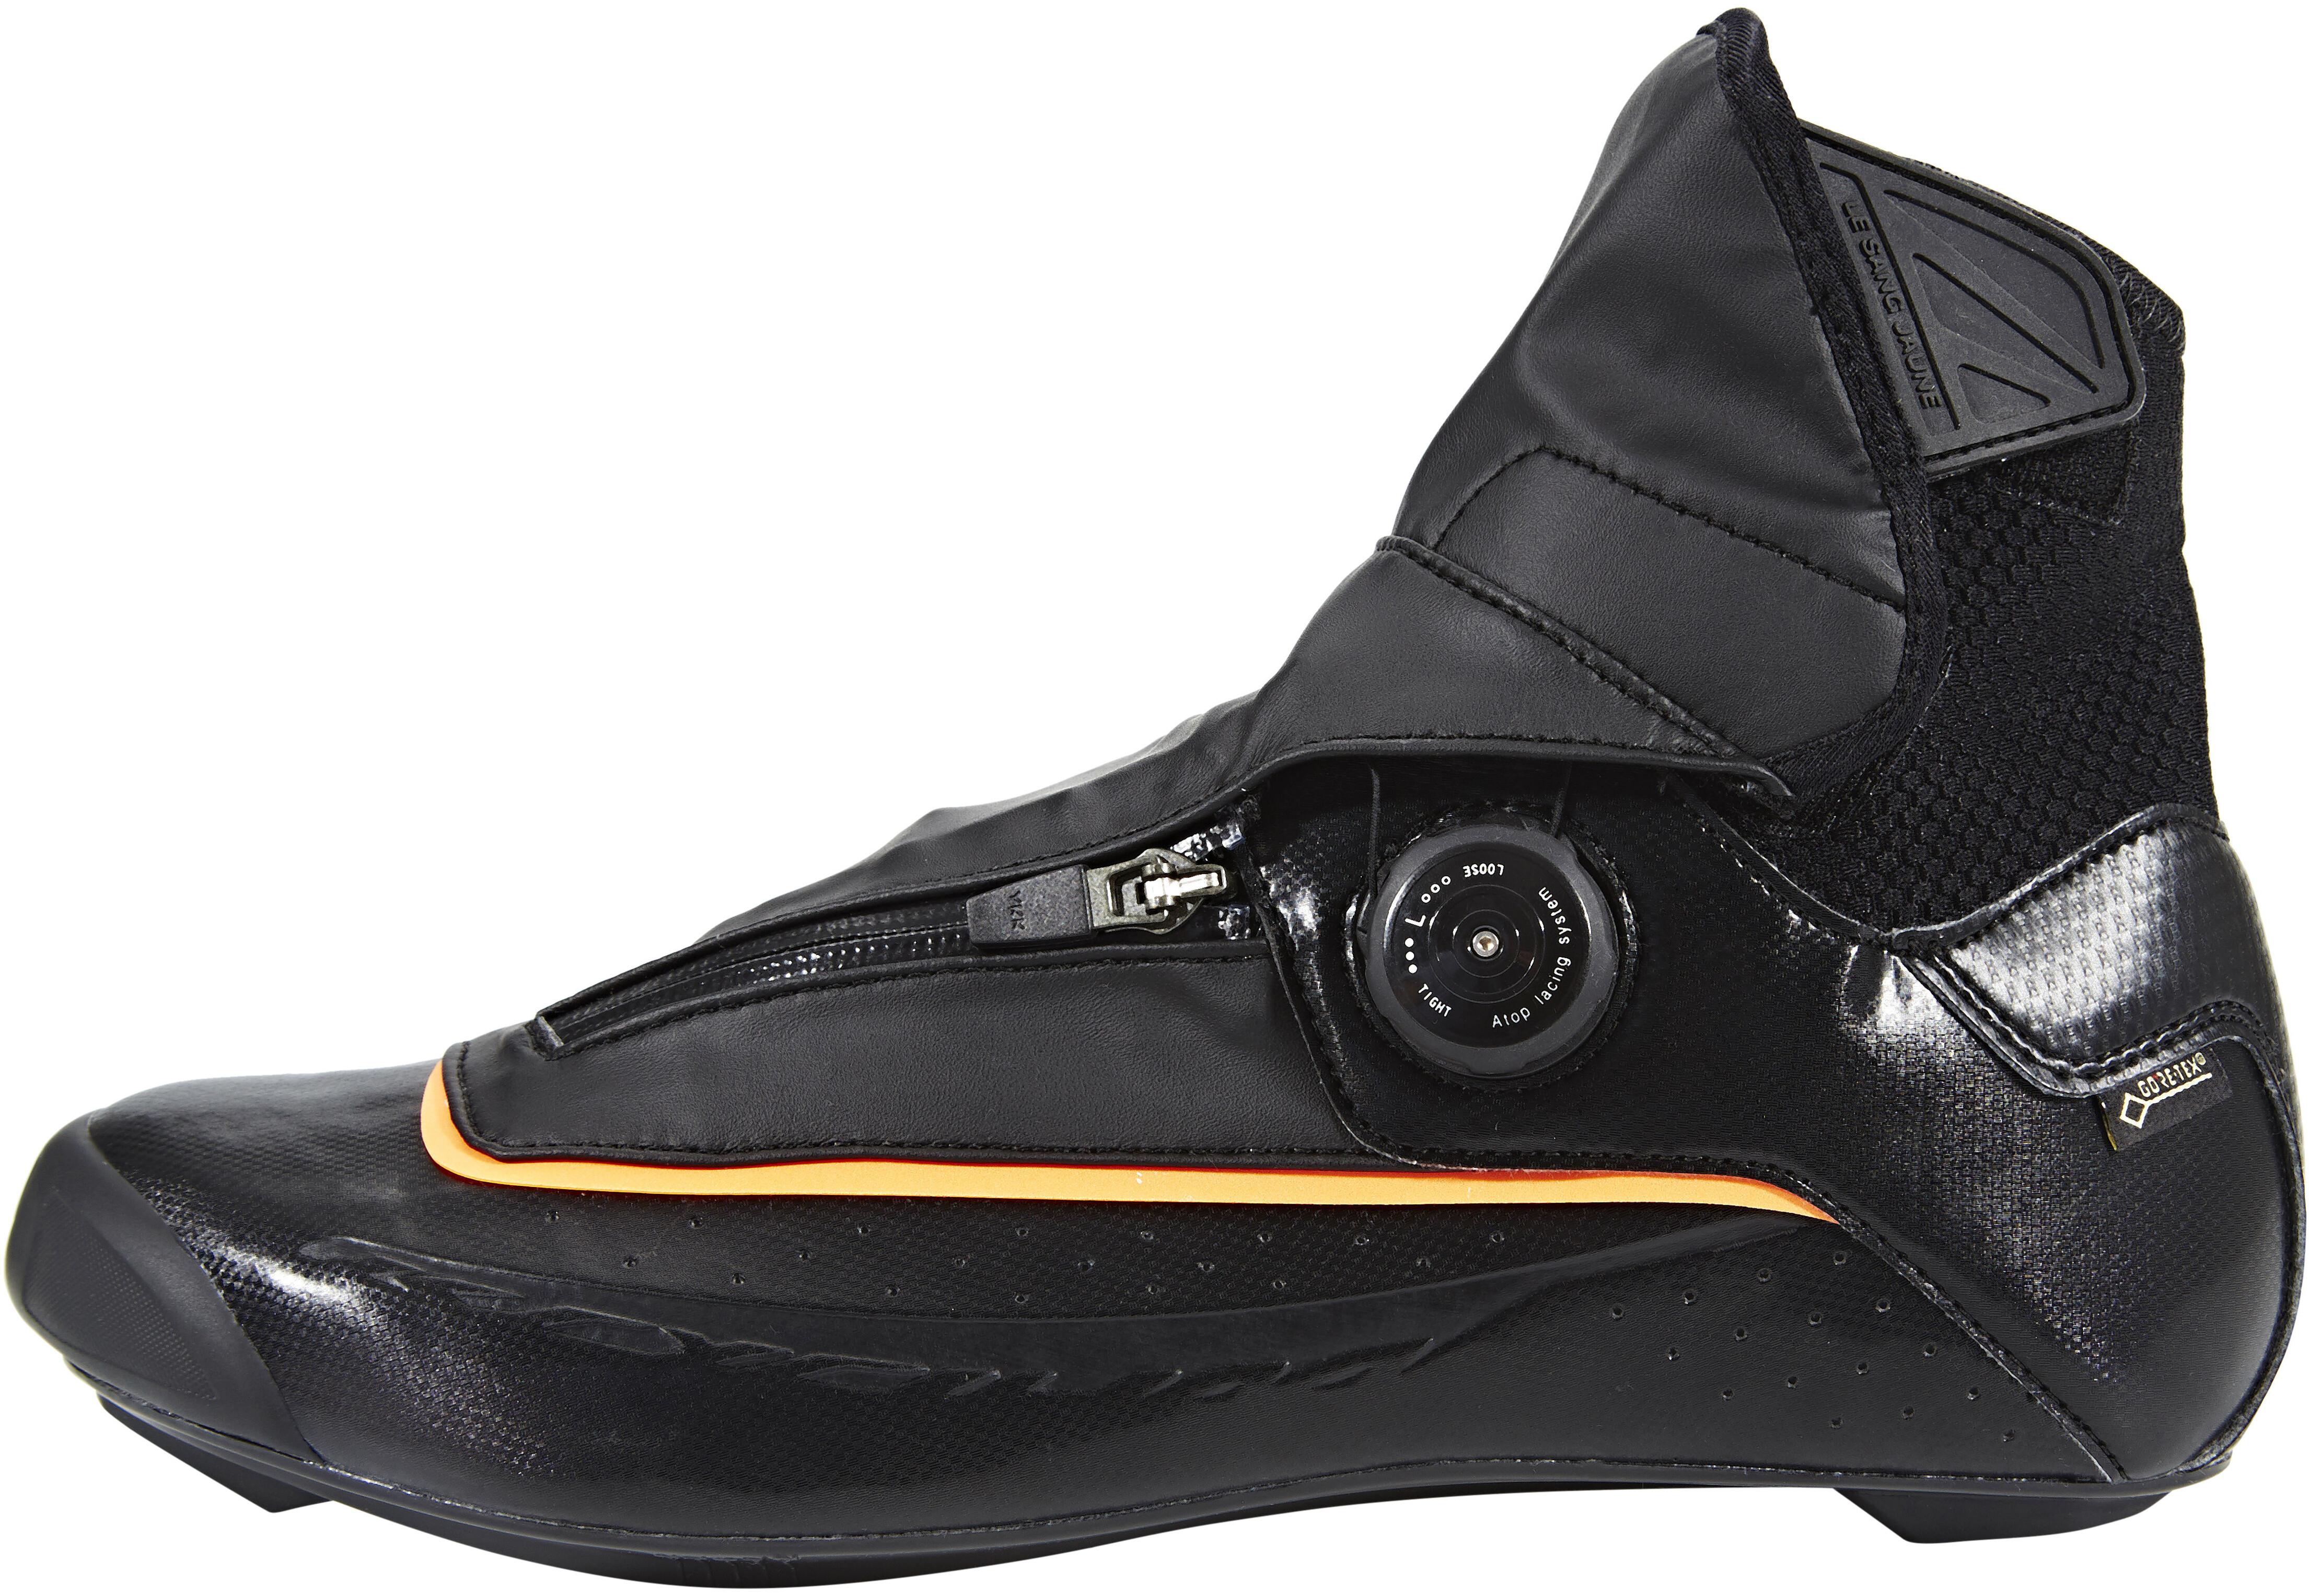 68433a0dd5f Mavic Ksyrium Pro Thermo Shoes black/black at Bikester.co.uk